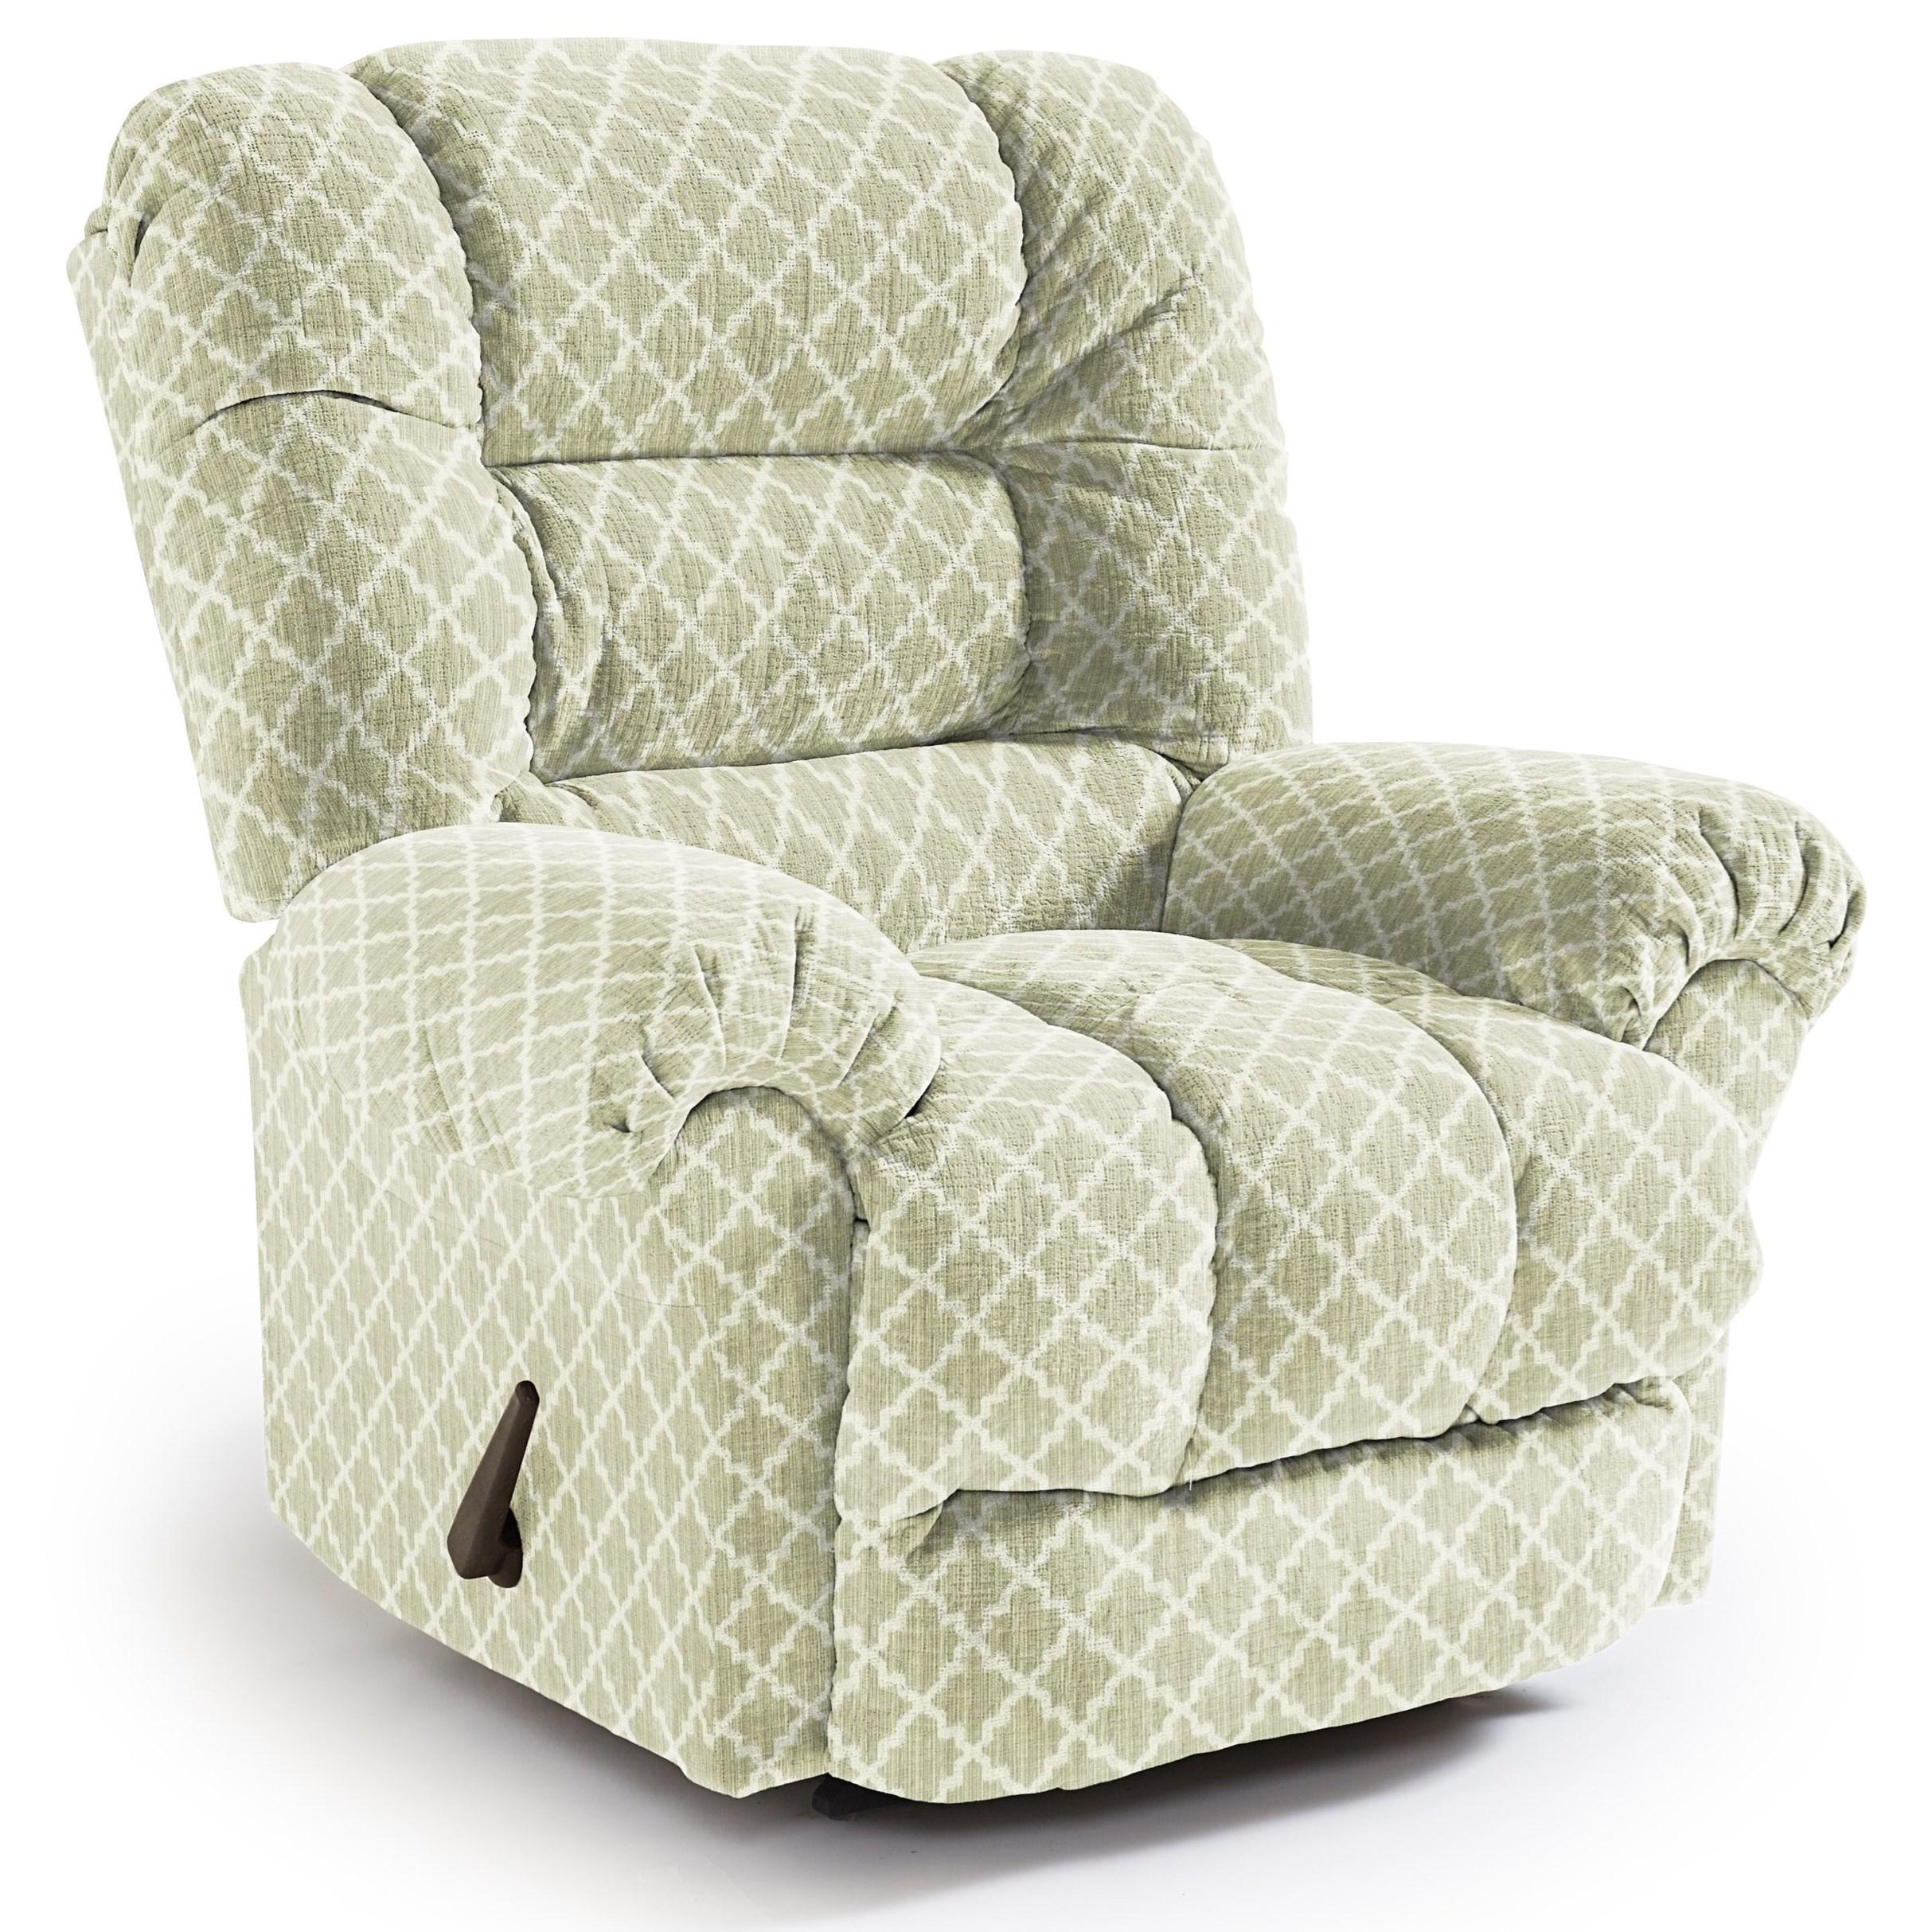 Best Home Furnishings Recliners - Medium Seger Wallhugger Recliner - Item Number: 1452936368-28841